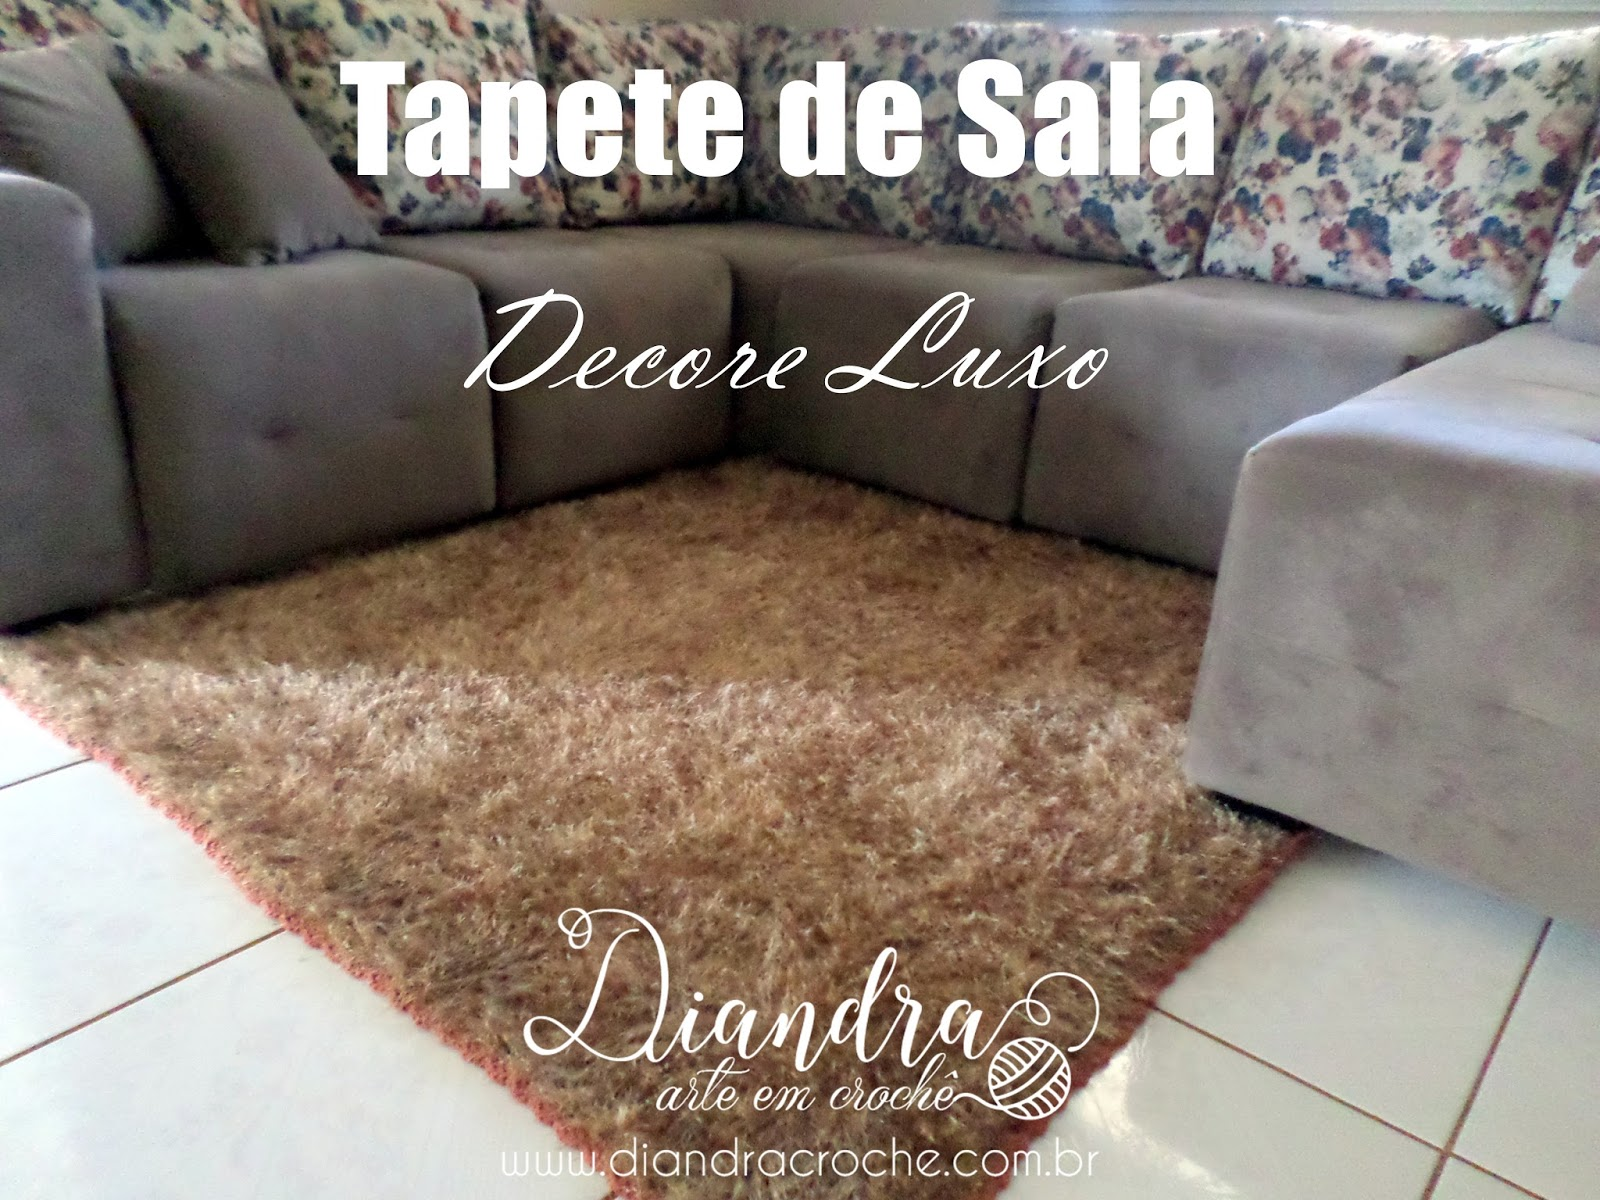 Diandra Arte Em Croch Tapete De Sala Decore Luxo